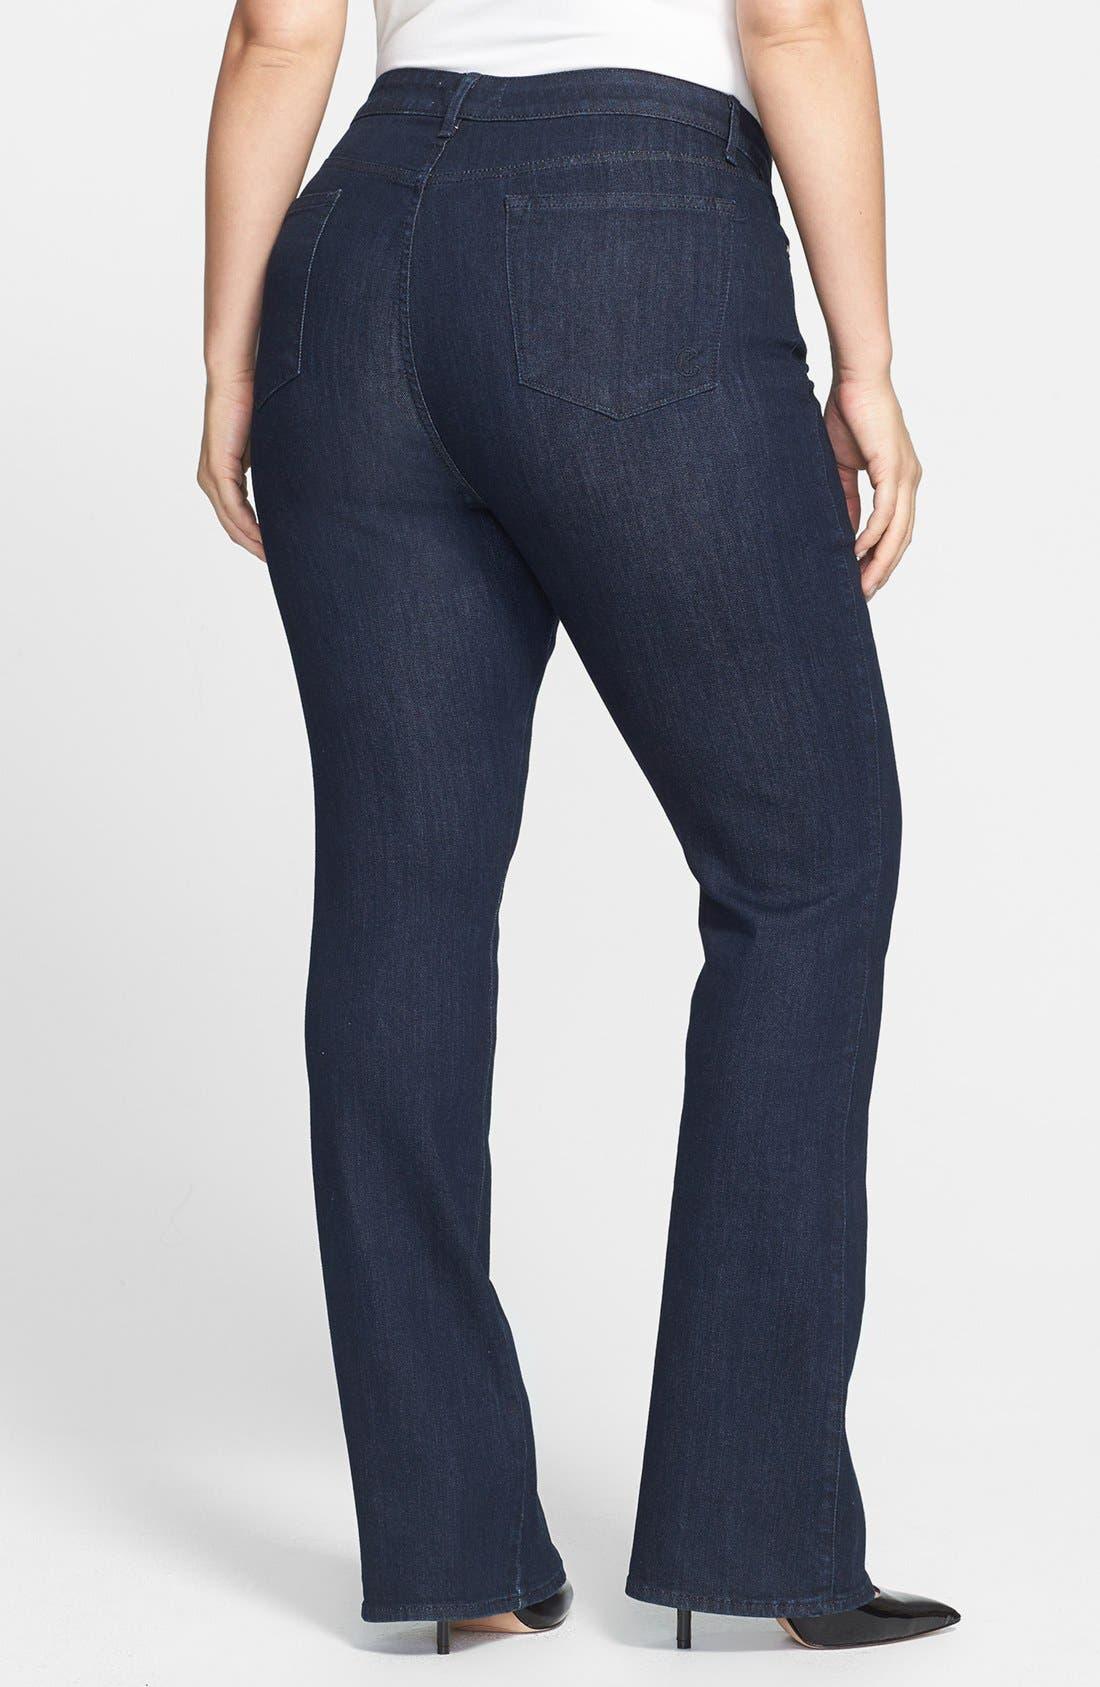 Alternate Image 2  - CJ by Cookie Johnson 'Grace' Bootcut Stretch Jeans (Plus Size)